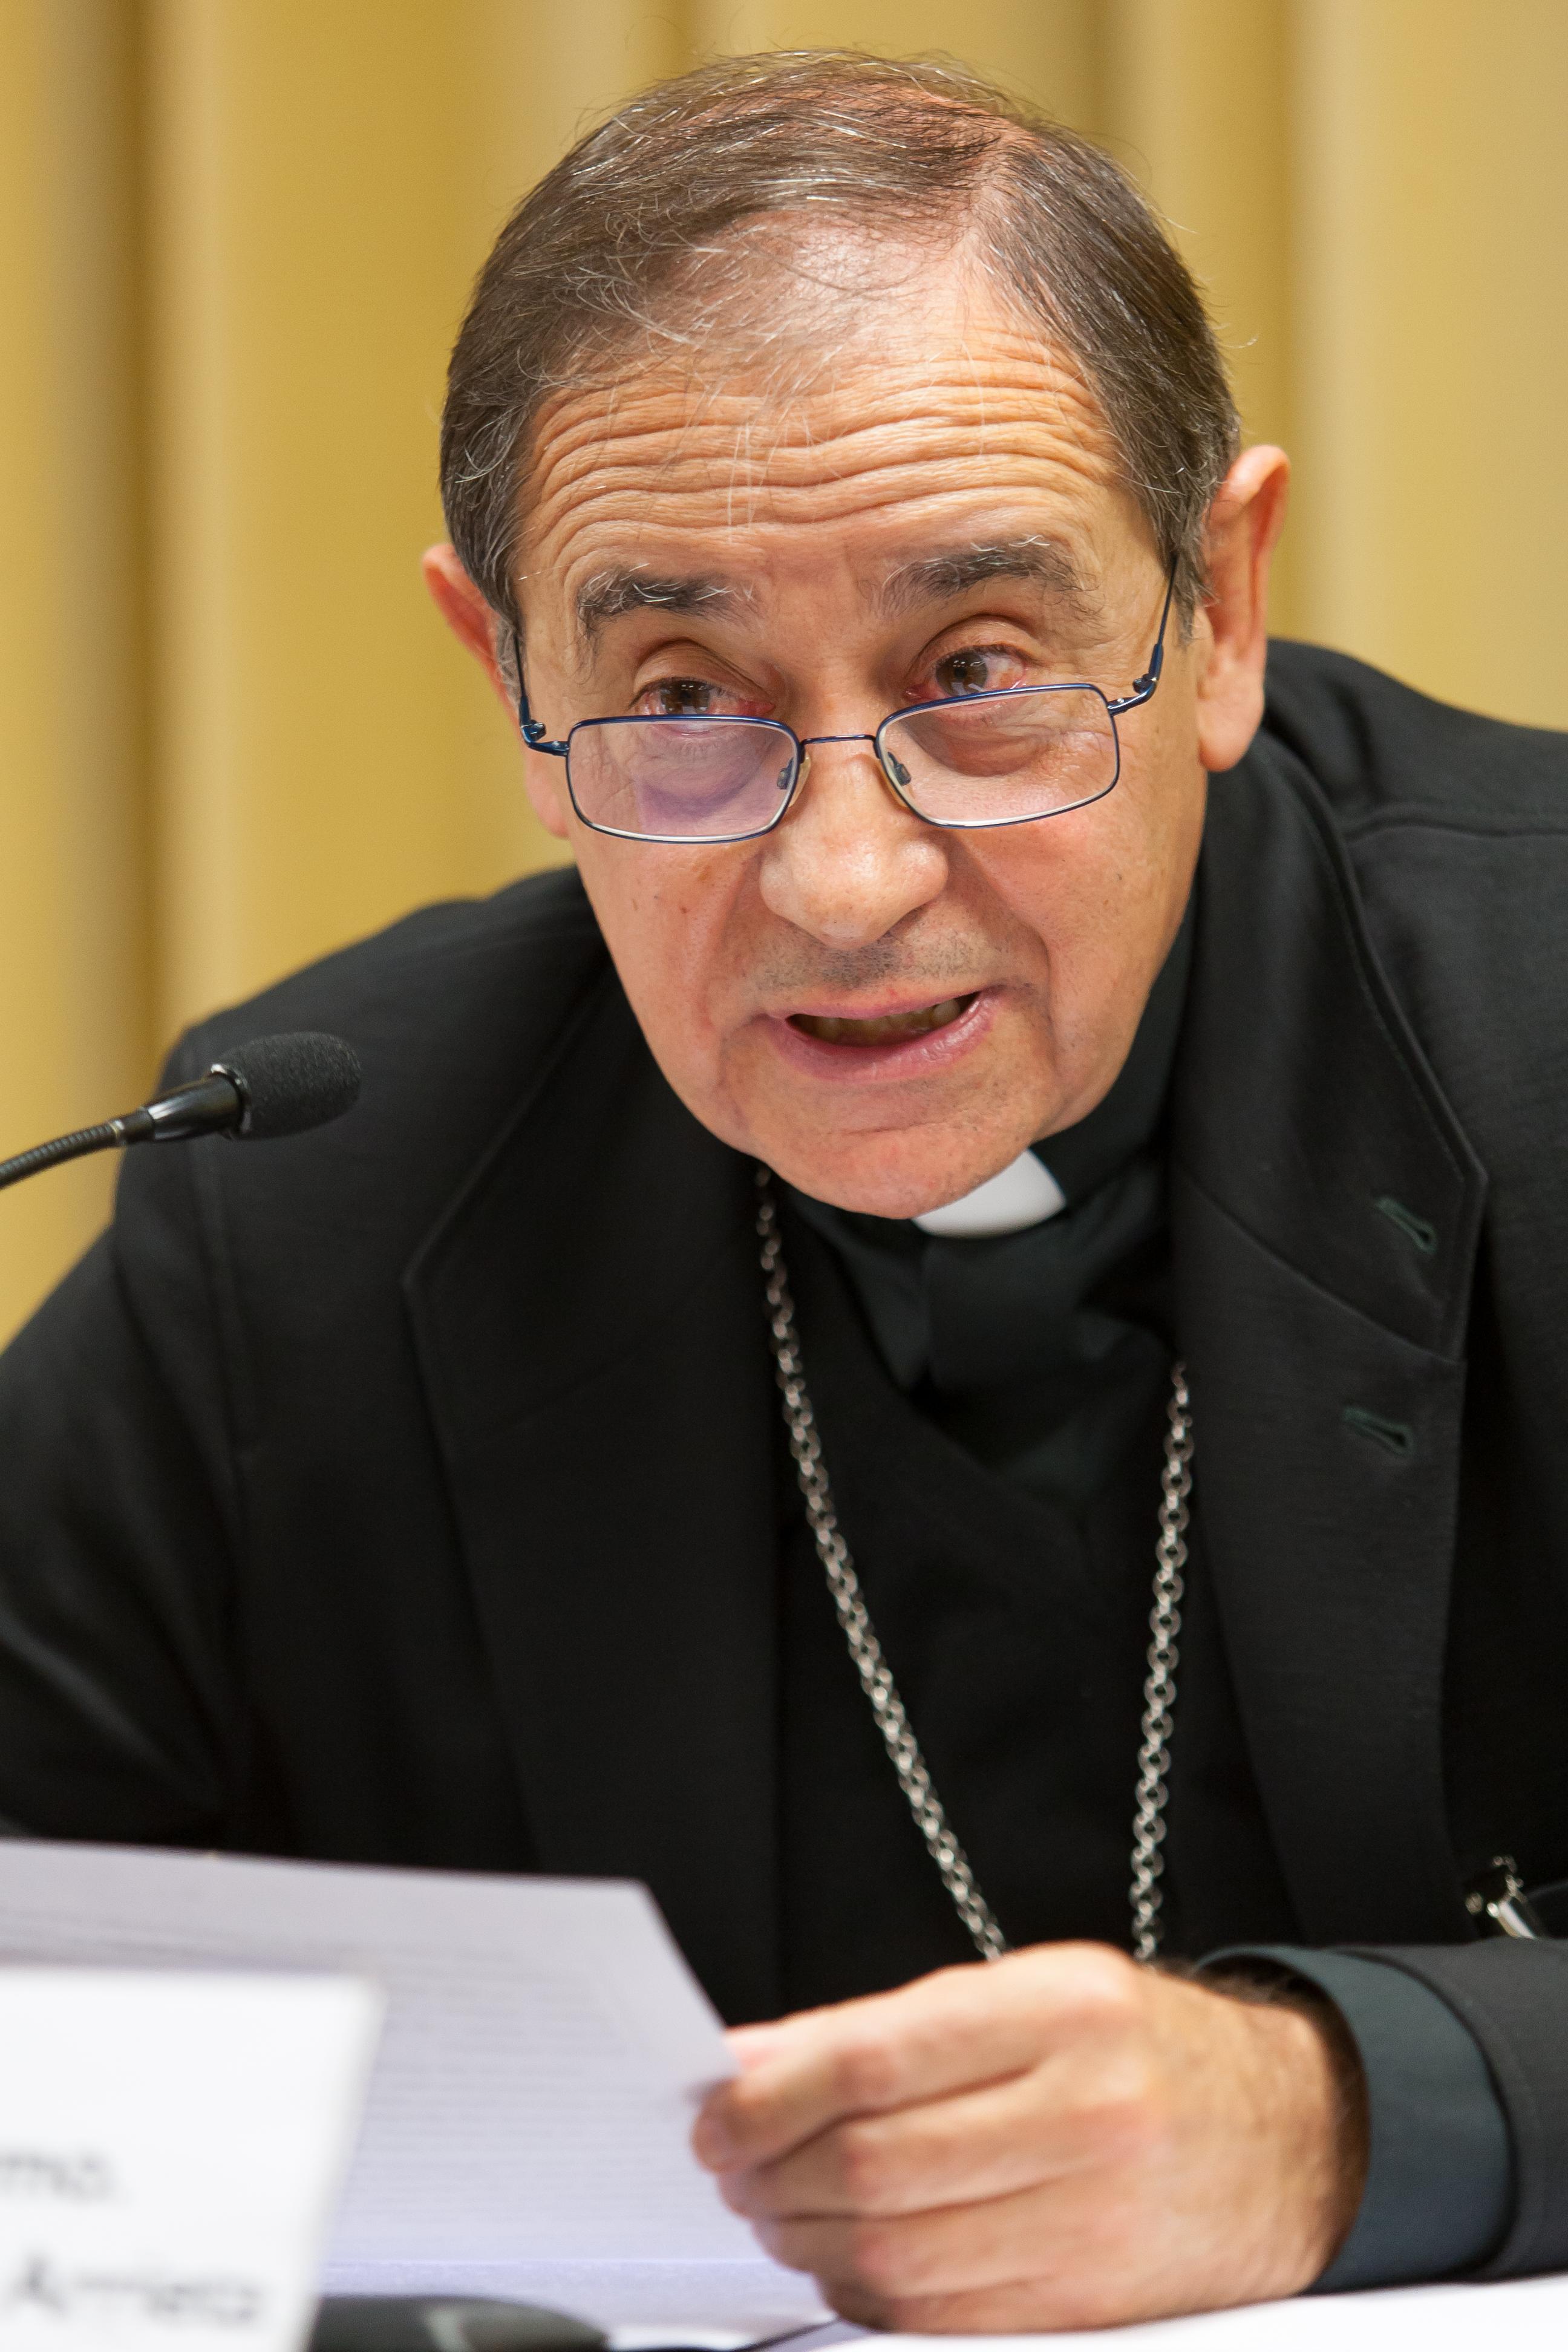 Mons. Juan Ignacio Arrieta © Universidad de Navarra